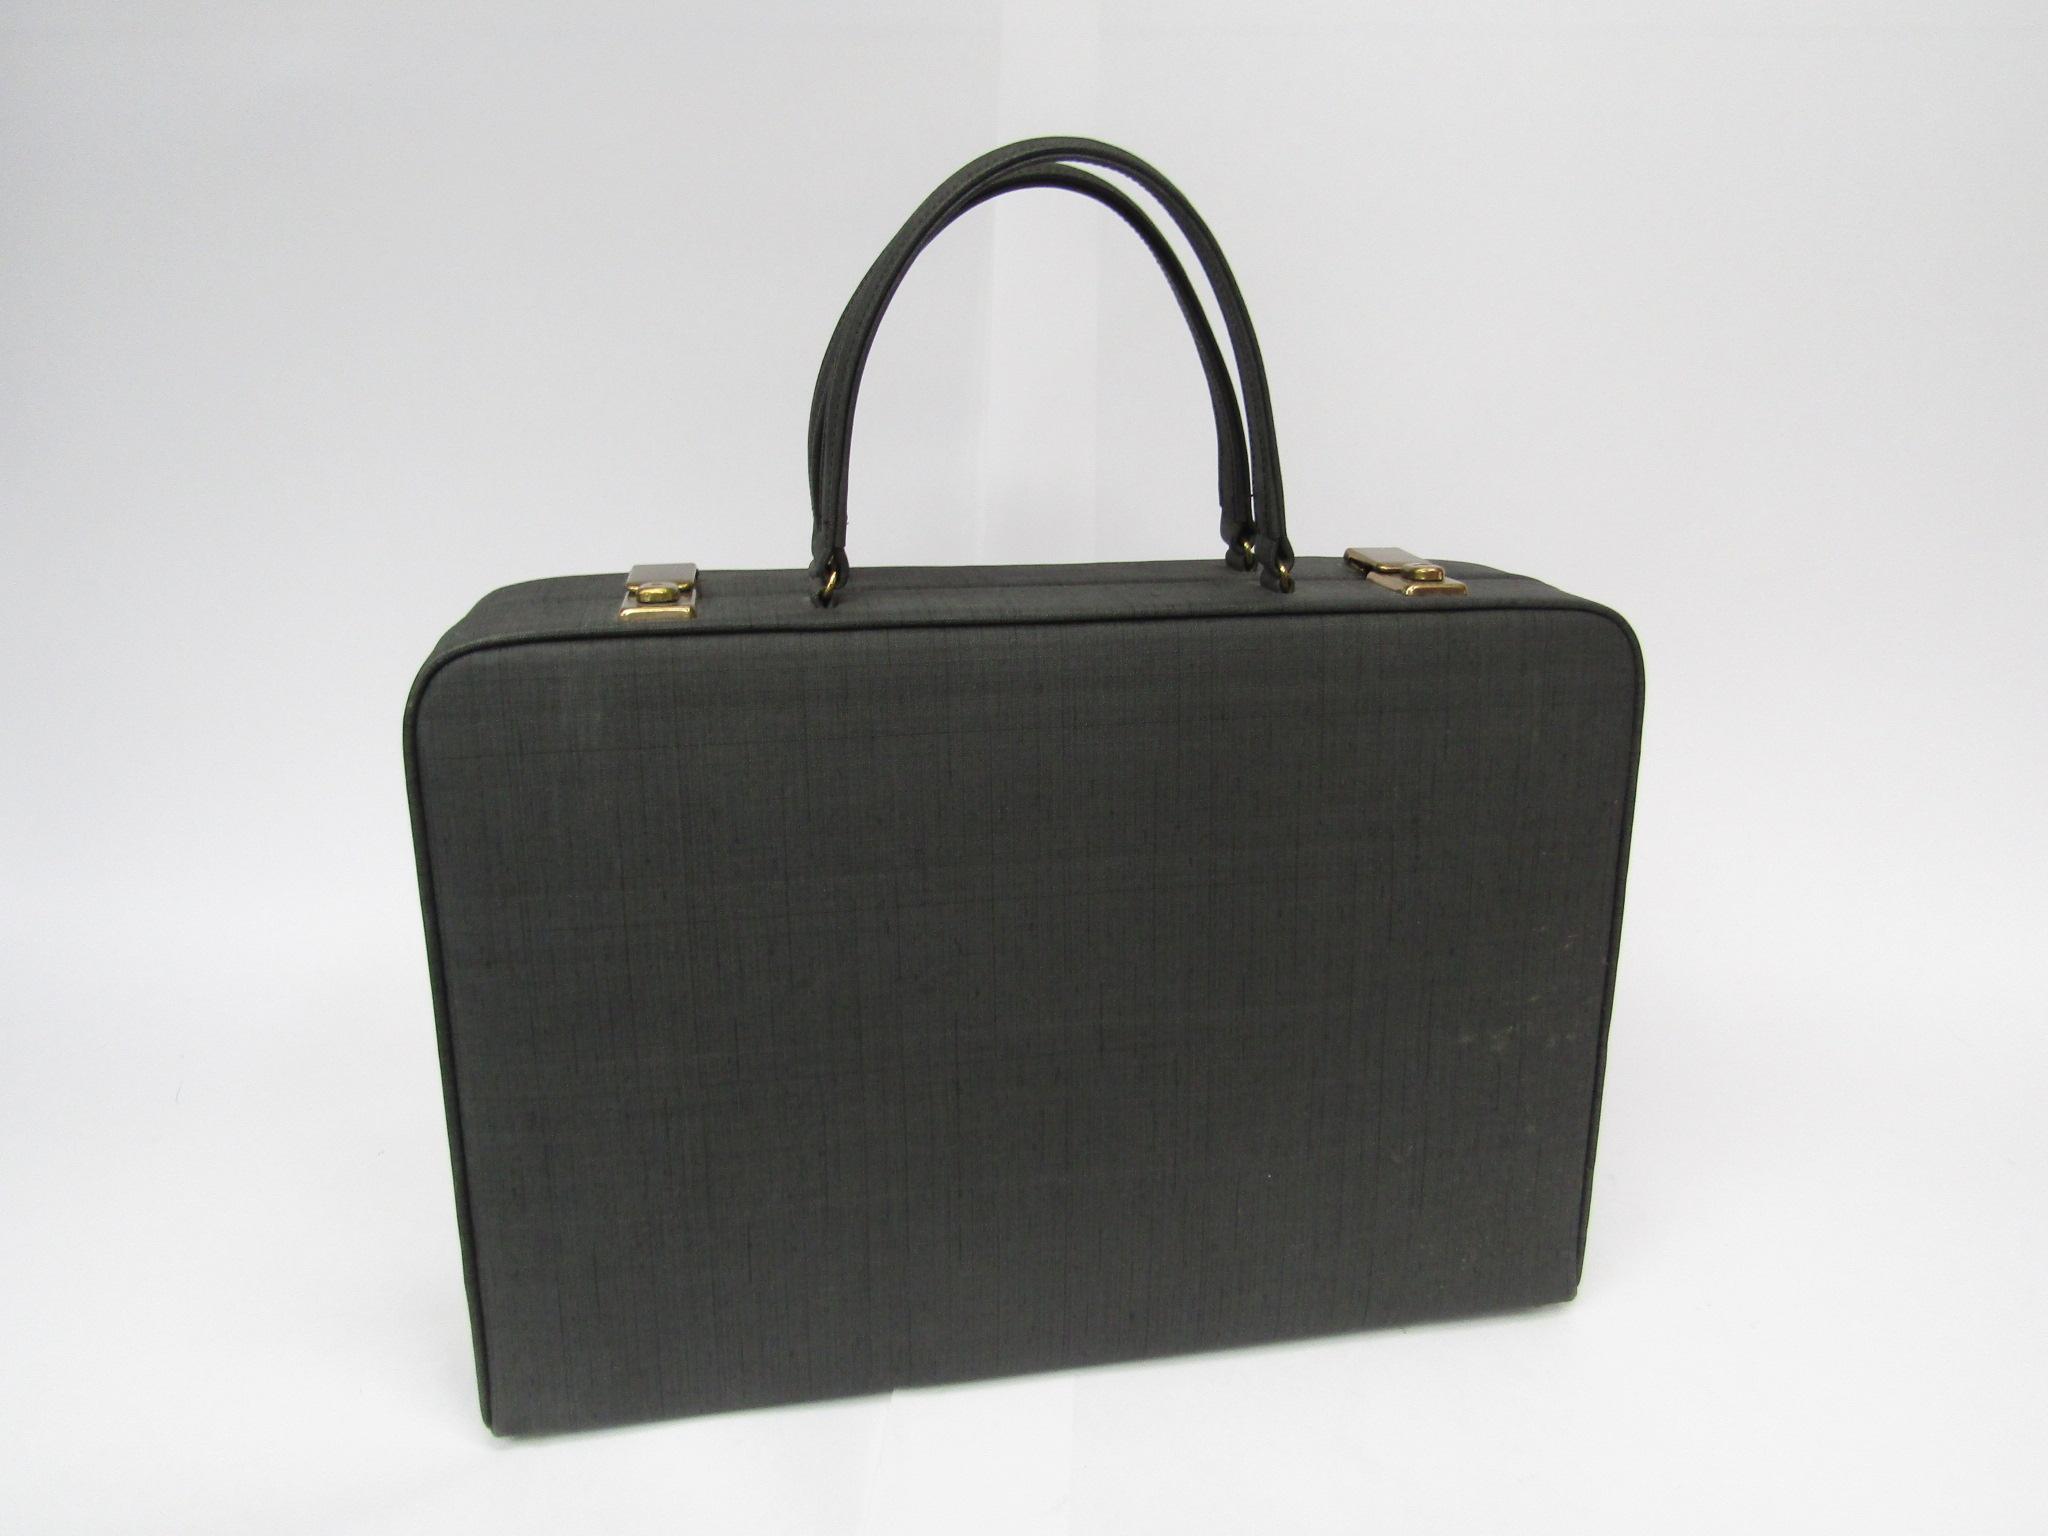 Elizabeth Arden beauty/vanity case in charcoal, beige ruched interior,